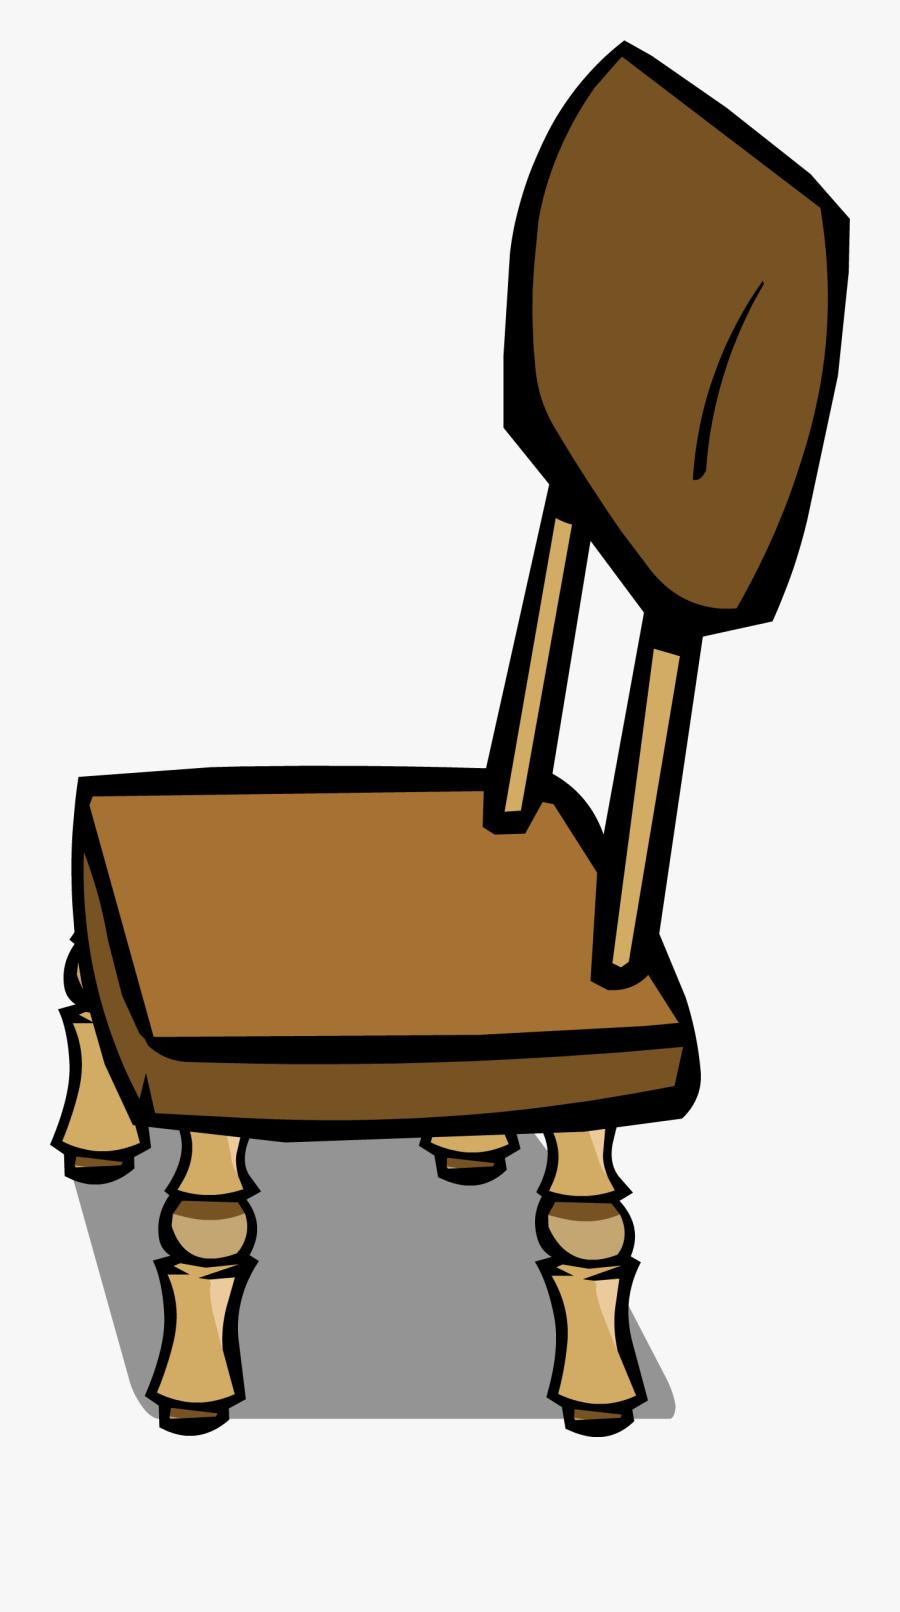 Dinner Chair Sprite - Chair Sprite, Transparent Clipart